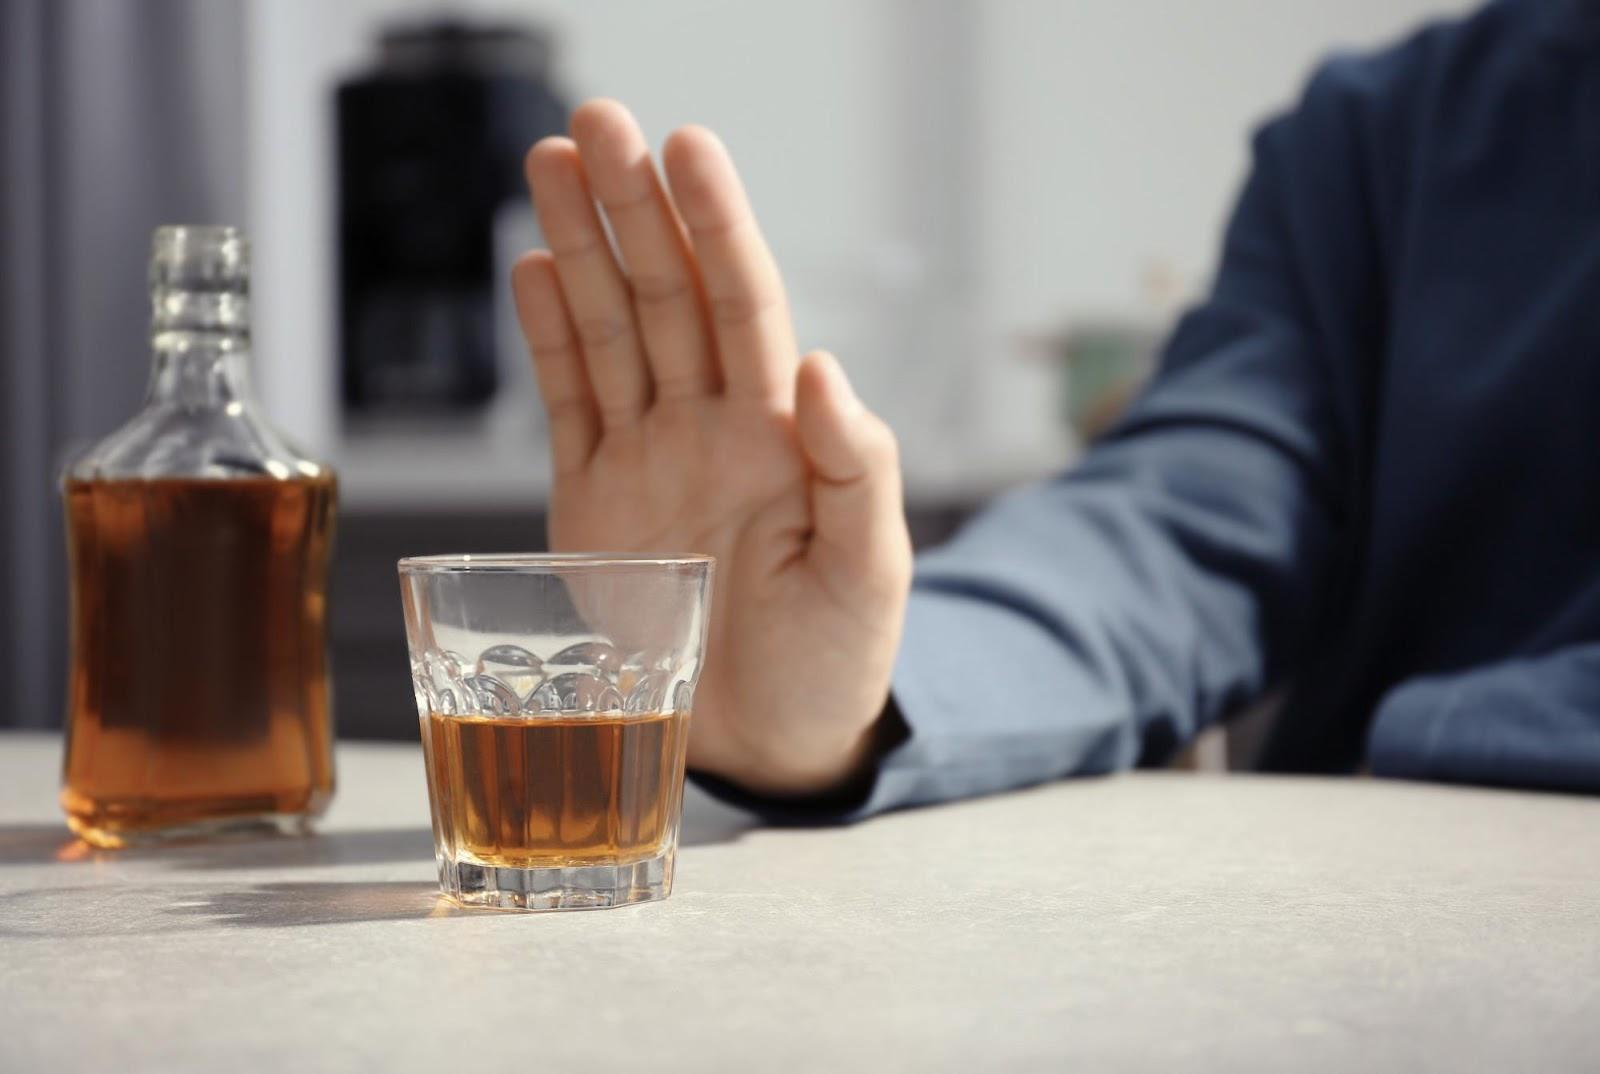 Overcoming Alcohol Addiction